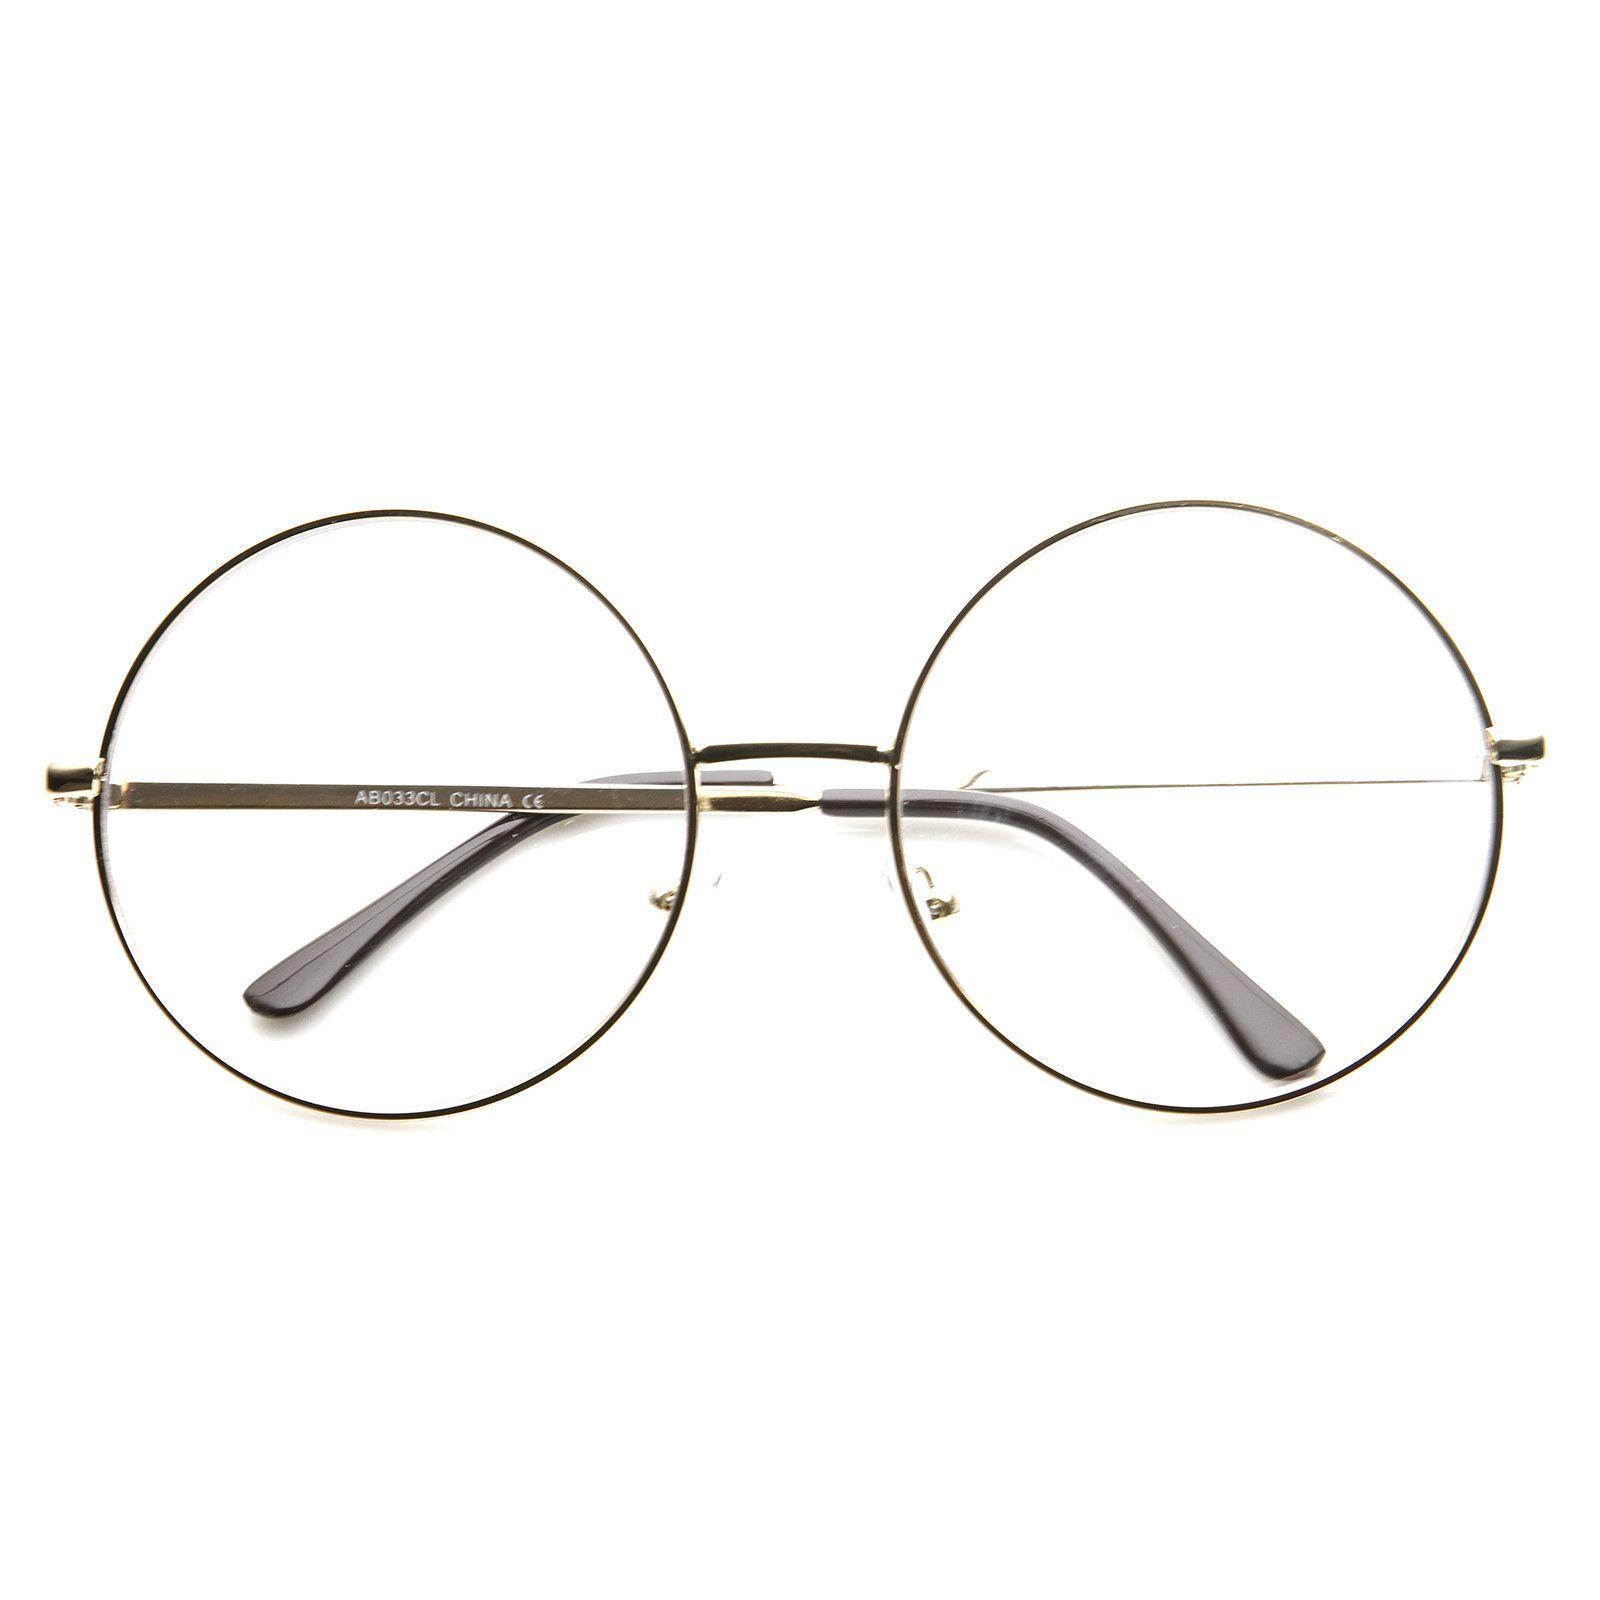 1920 S Vintage Era Large Round Metal Clear Lens Glasses 8714